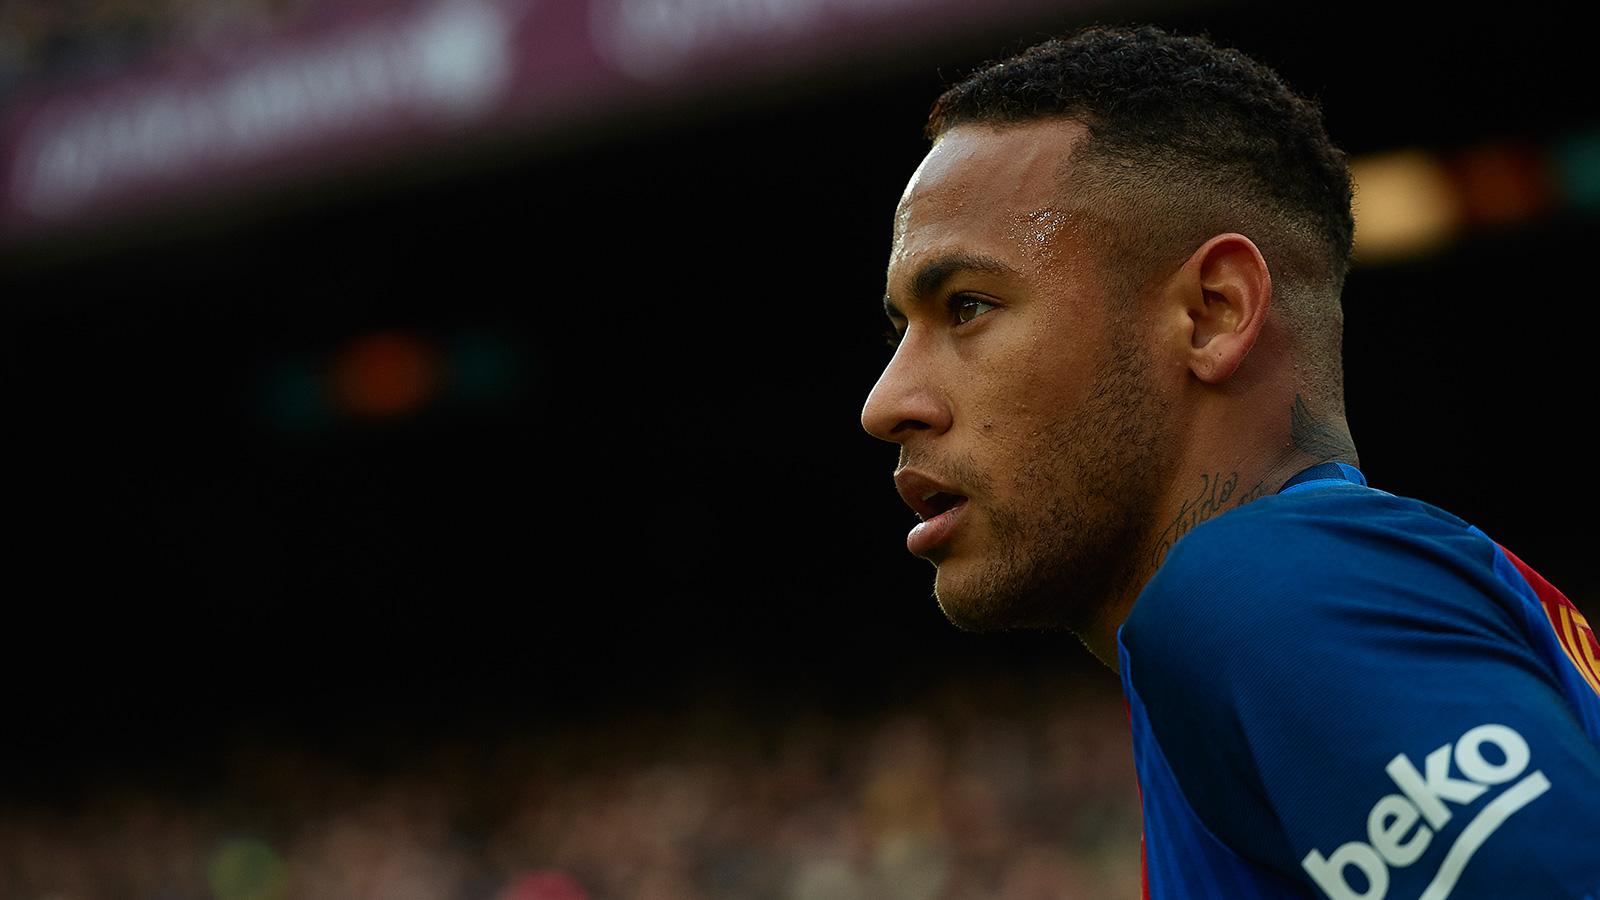 Spanish prosecutors call for Neymar to serve two-year prison sentence